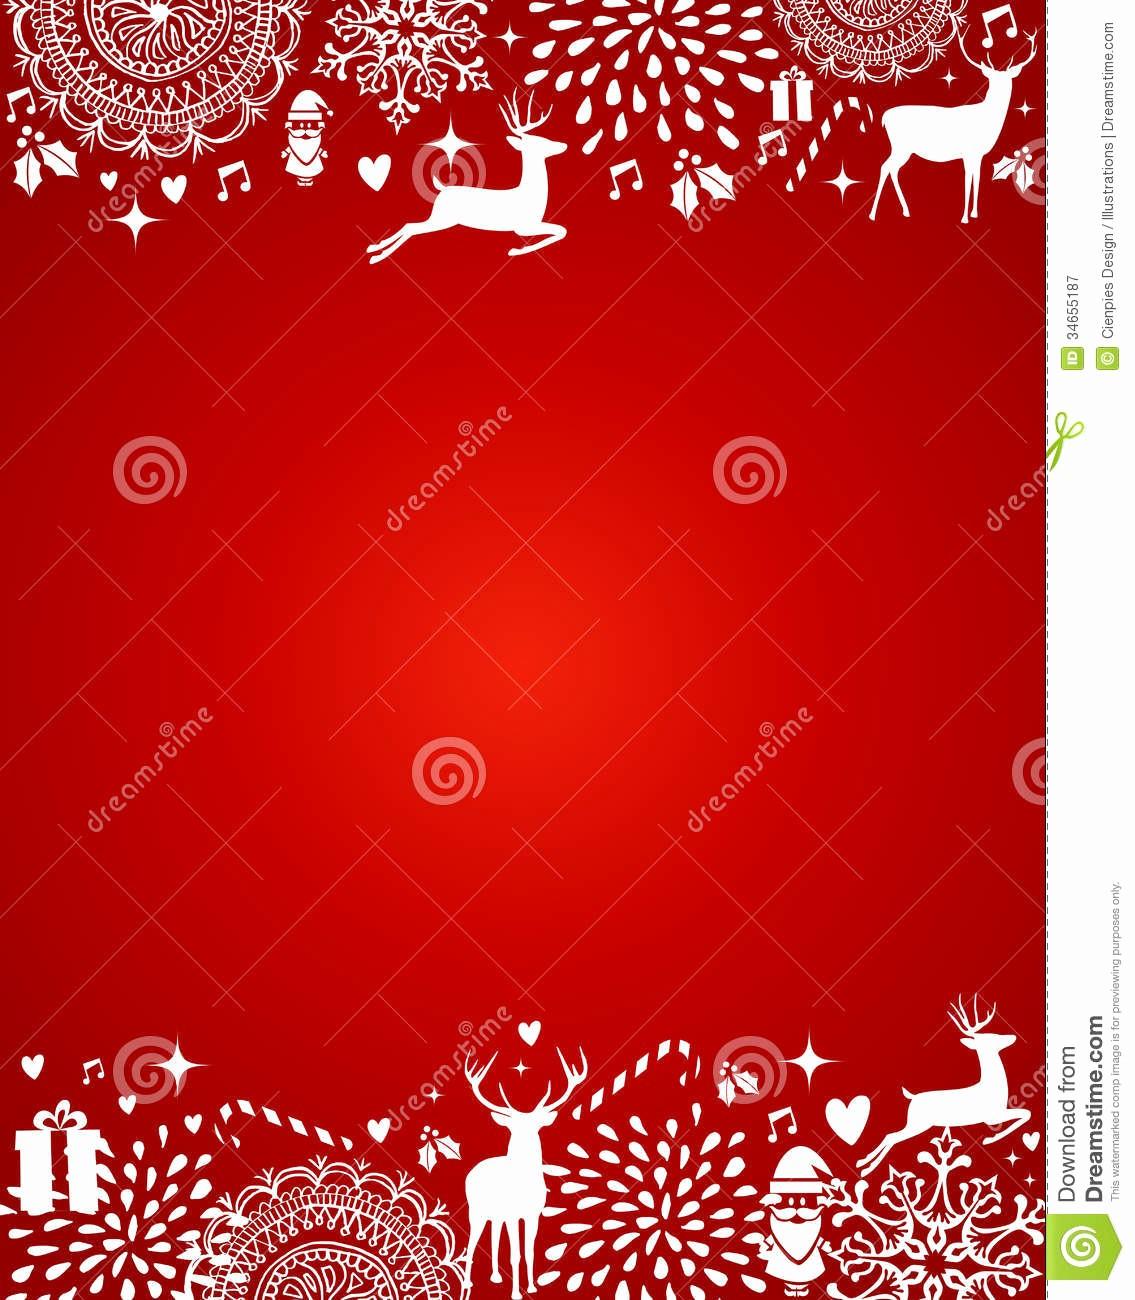 Free Microsoft Word Christmas Template Inspirational 17 Free Christmas Templates for Word Free Word